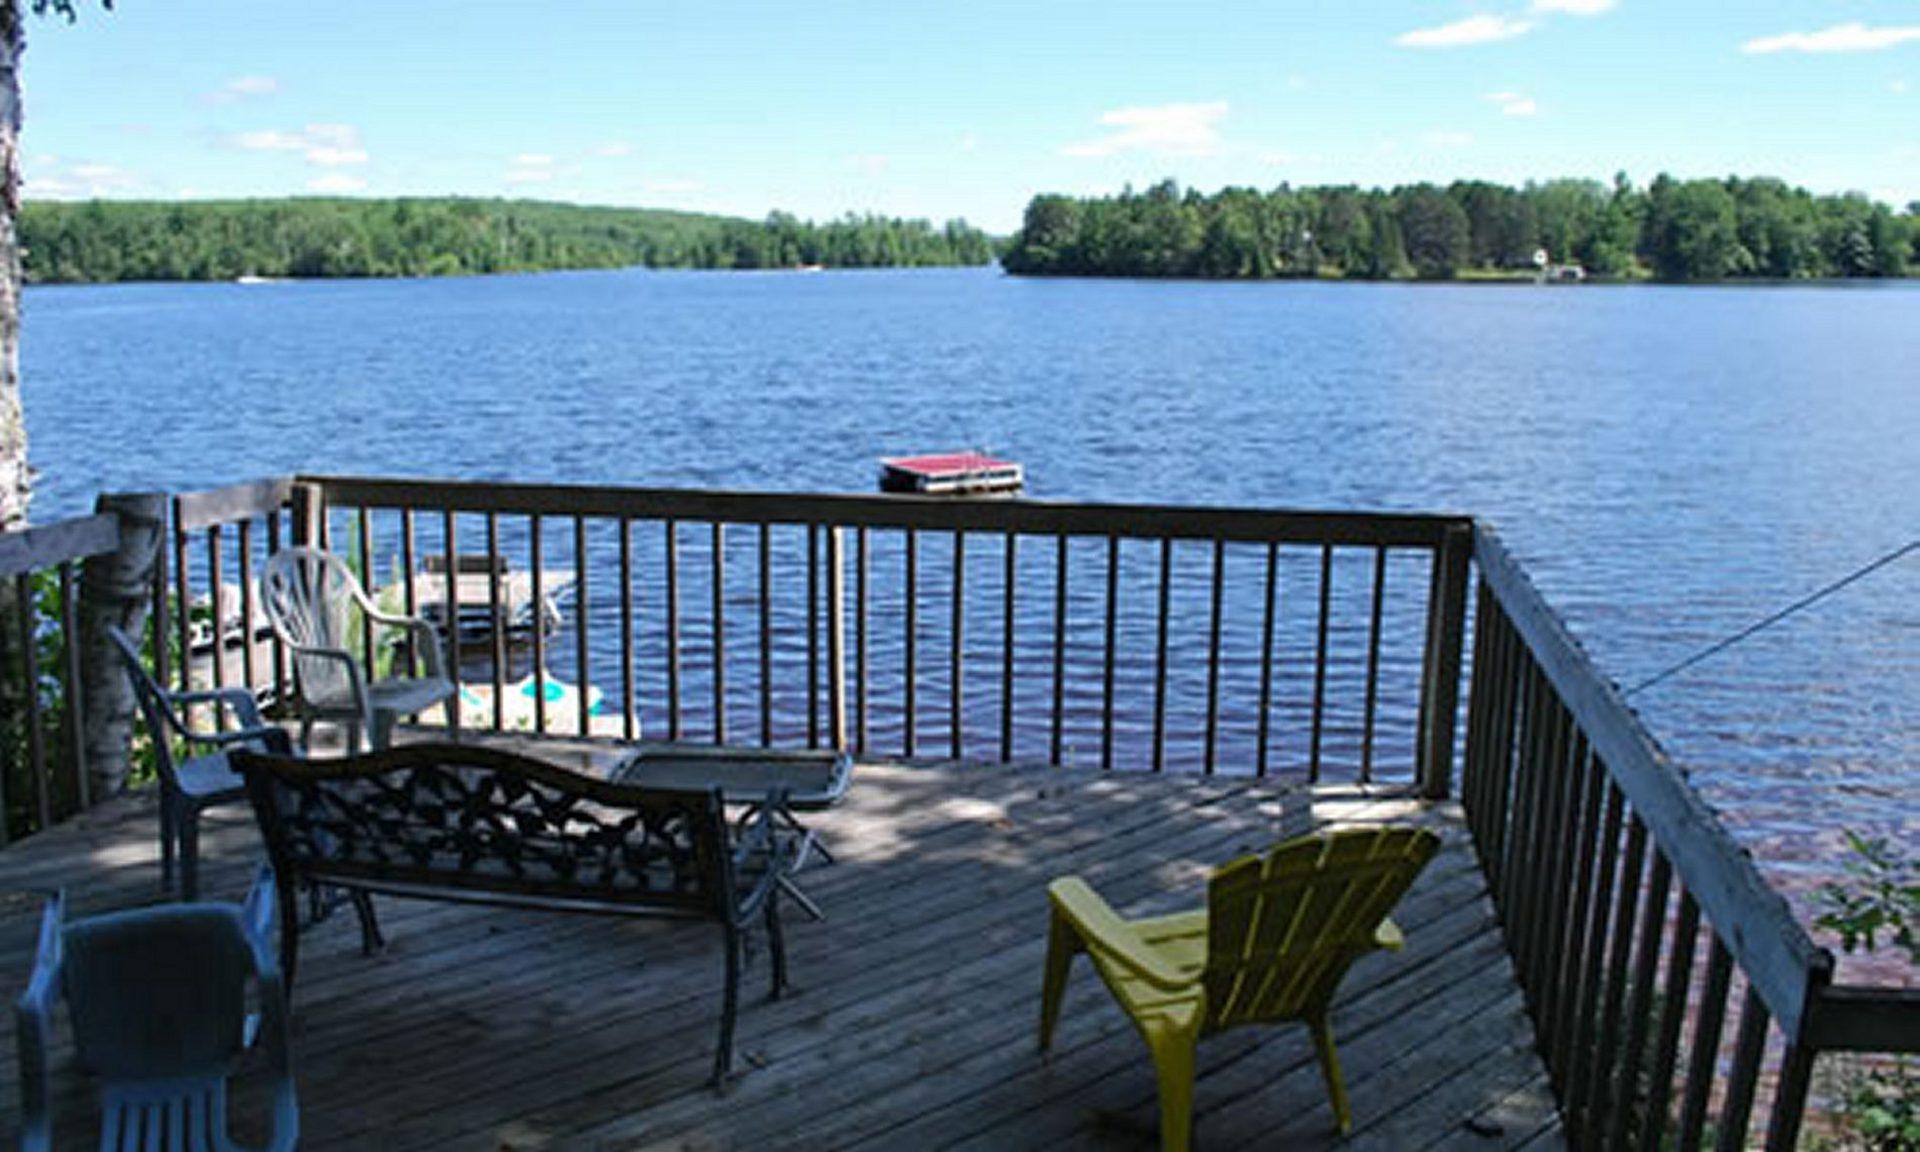 Welcome to Reiske's Island View Resort